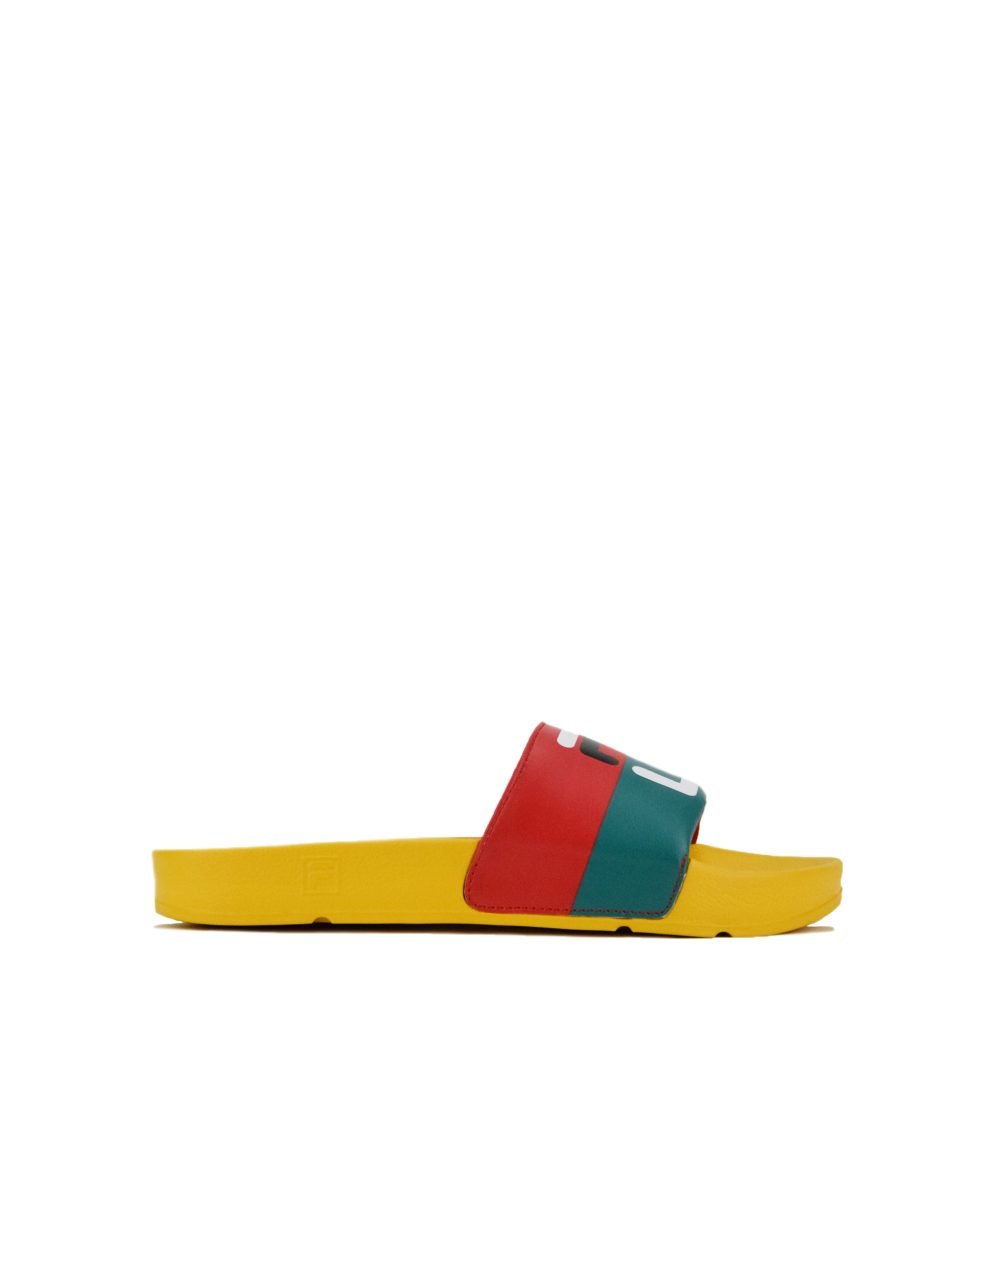 Fila Drifter Festival Slide (1SM00533-704) Yellow Light/Green/Red/Navy